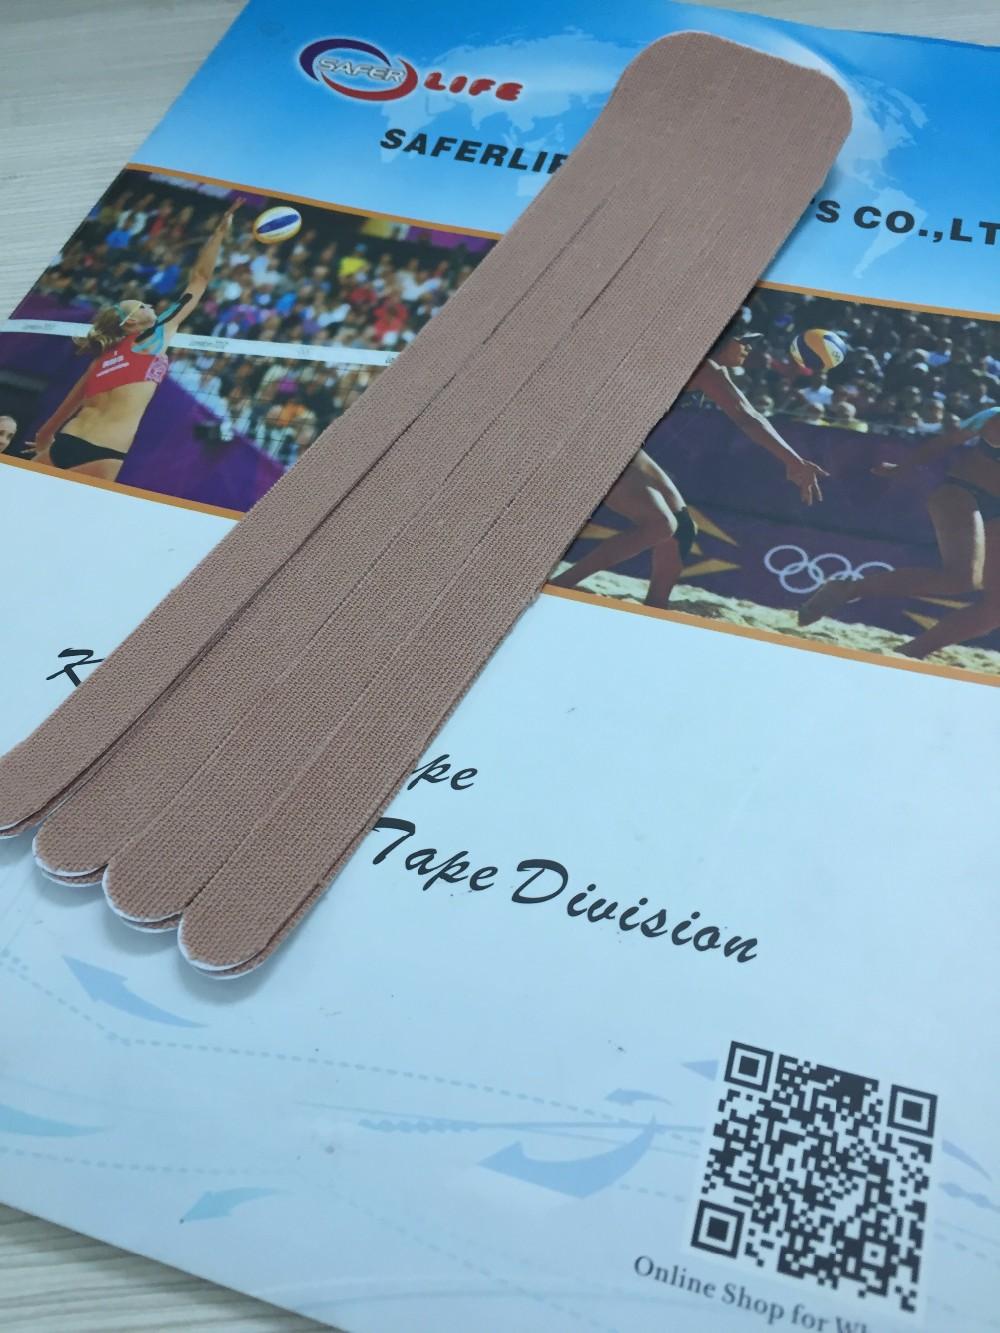 Olahraga Pertama Bantuan Tape Belakangleherbahulututpergelangan Penyangga Bahu Belakang Leher Lutut Pergelangan Tangan Dukungan